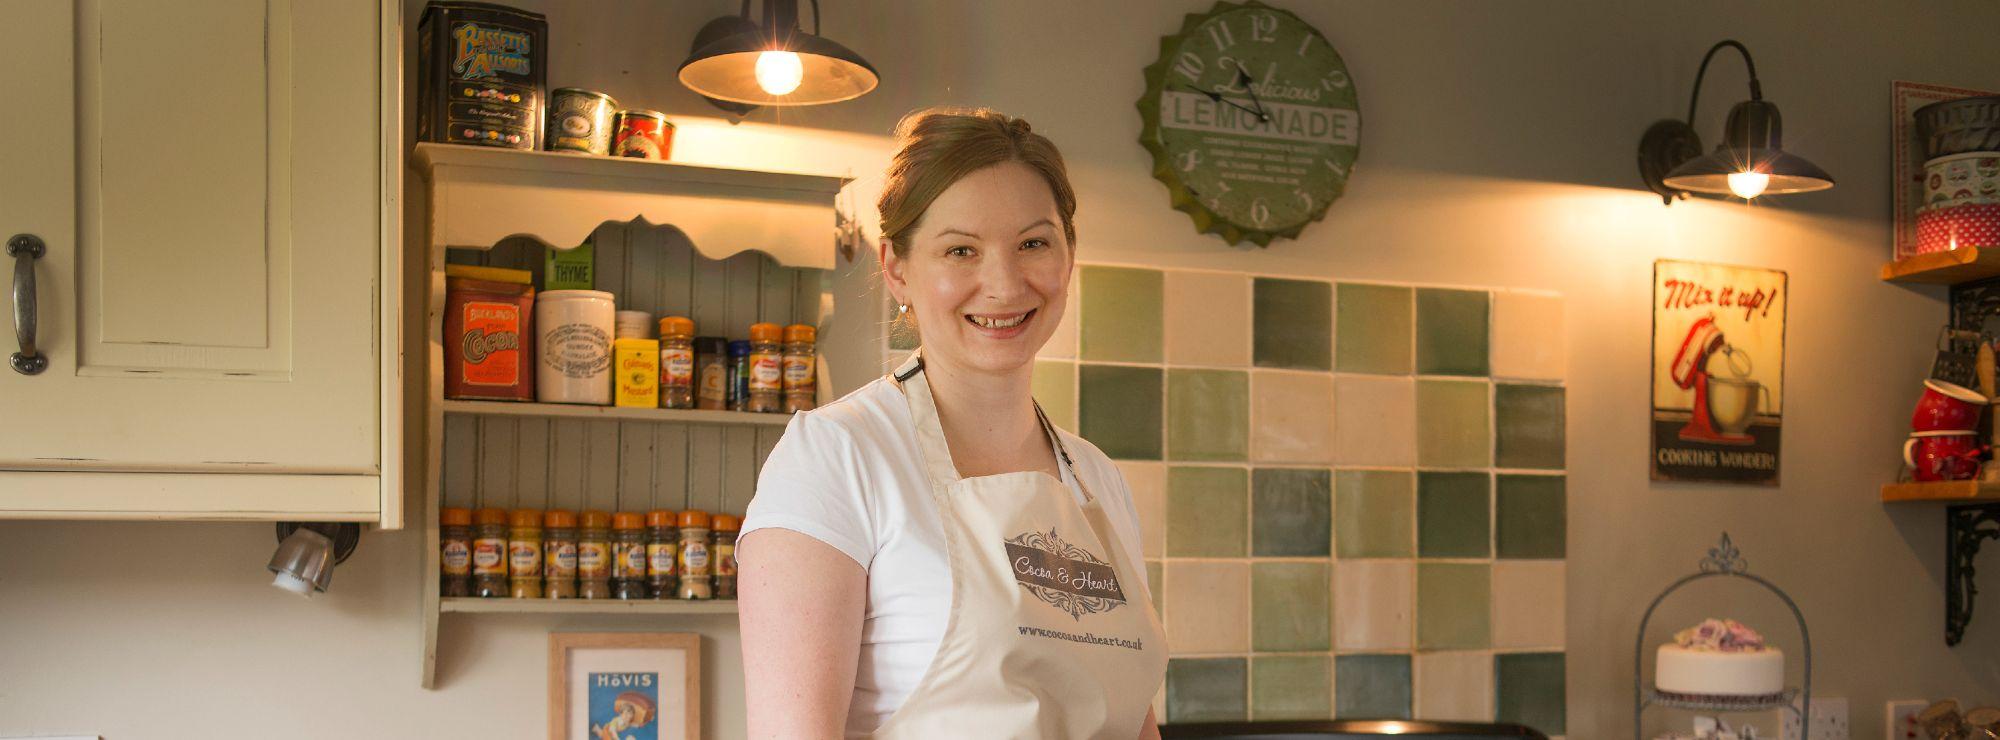 Cocoa & Heart's owner Magdalena Marsden